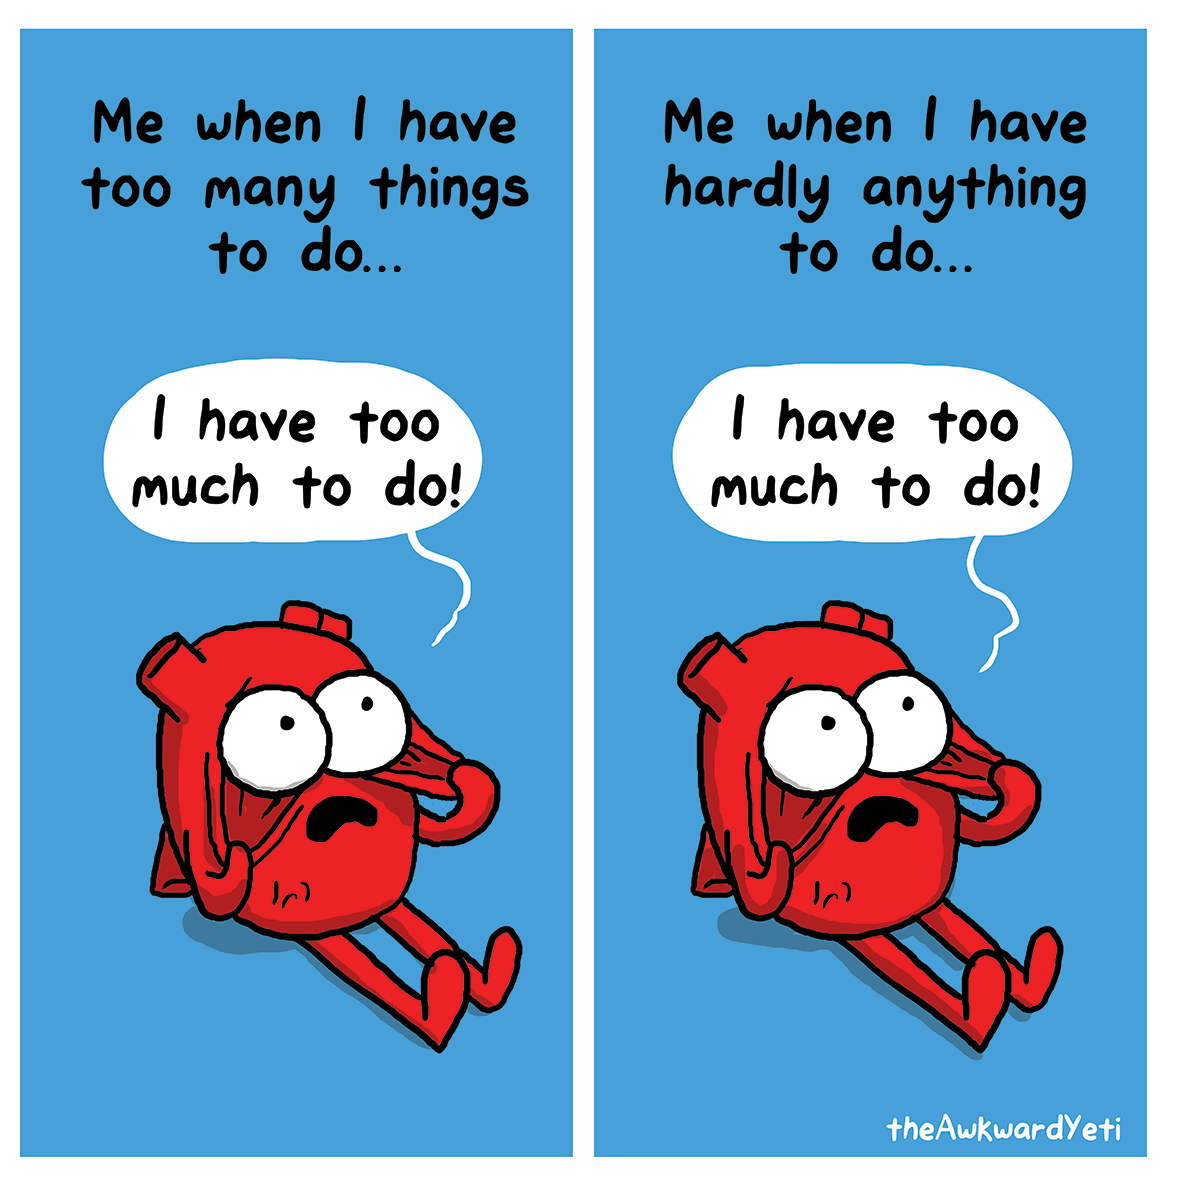 The Awkward Yeti   Things to Do